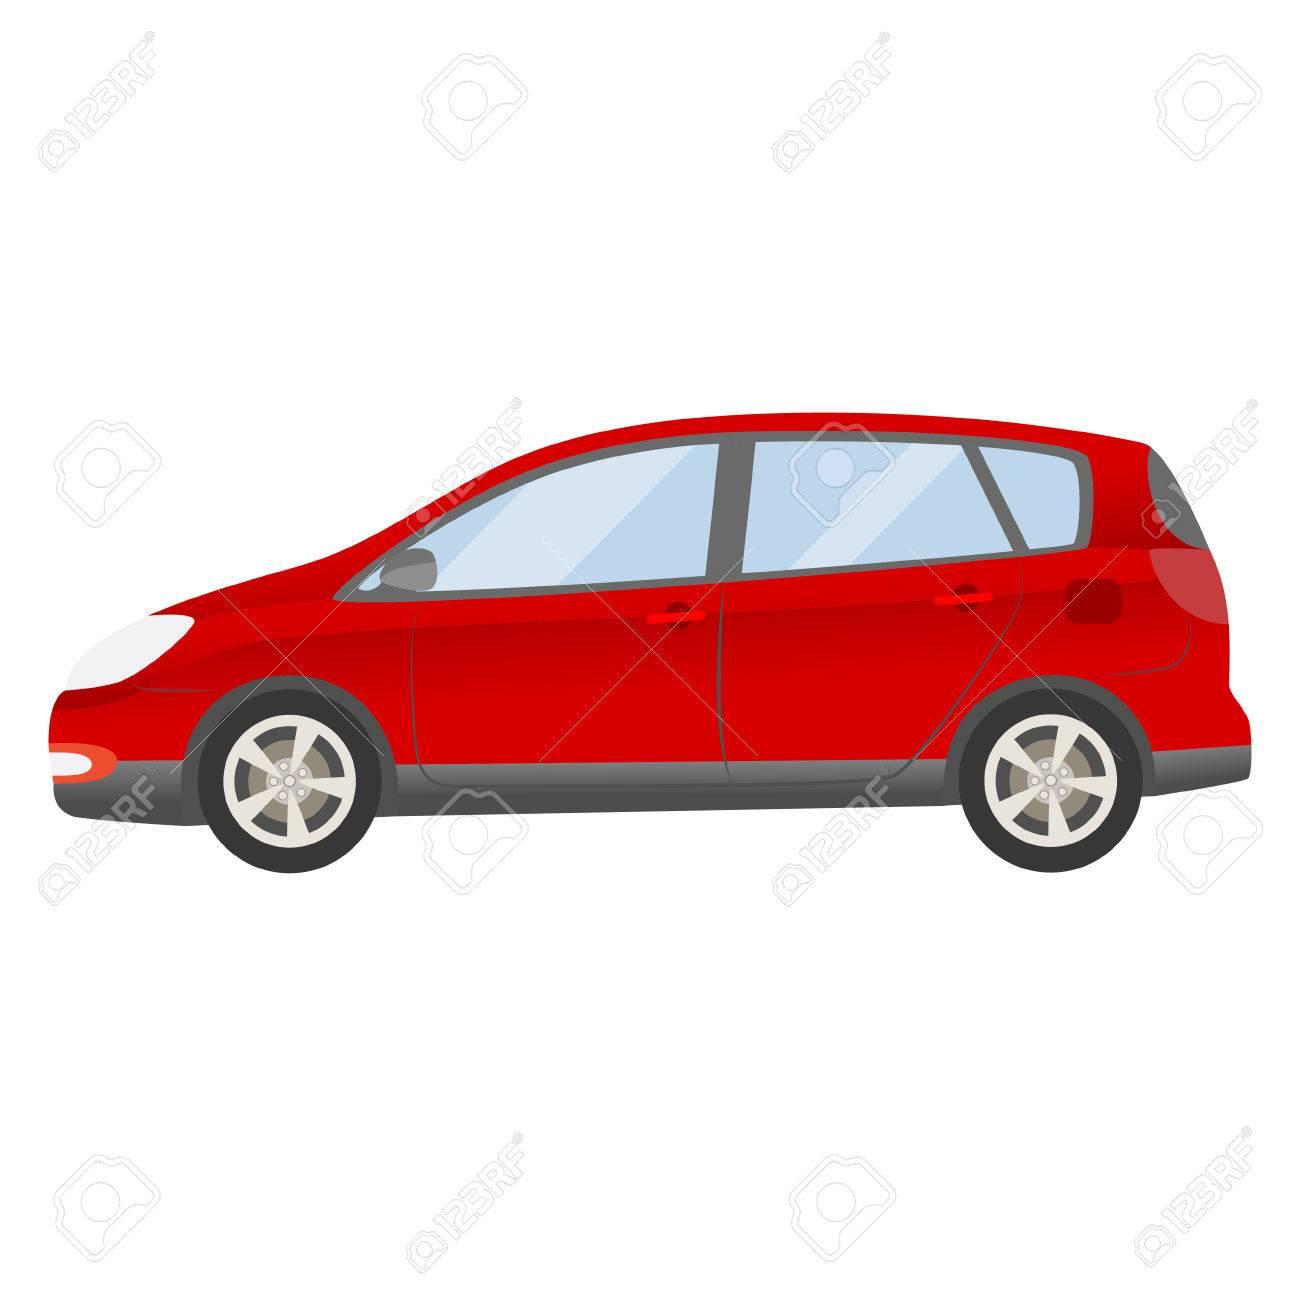 Perfect Smart Car Wrap Template Image Example Resume Ideas Rh  Fashionforlifesl Org